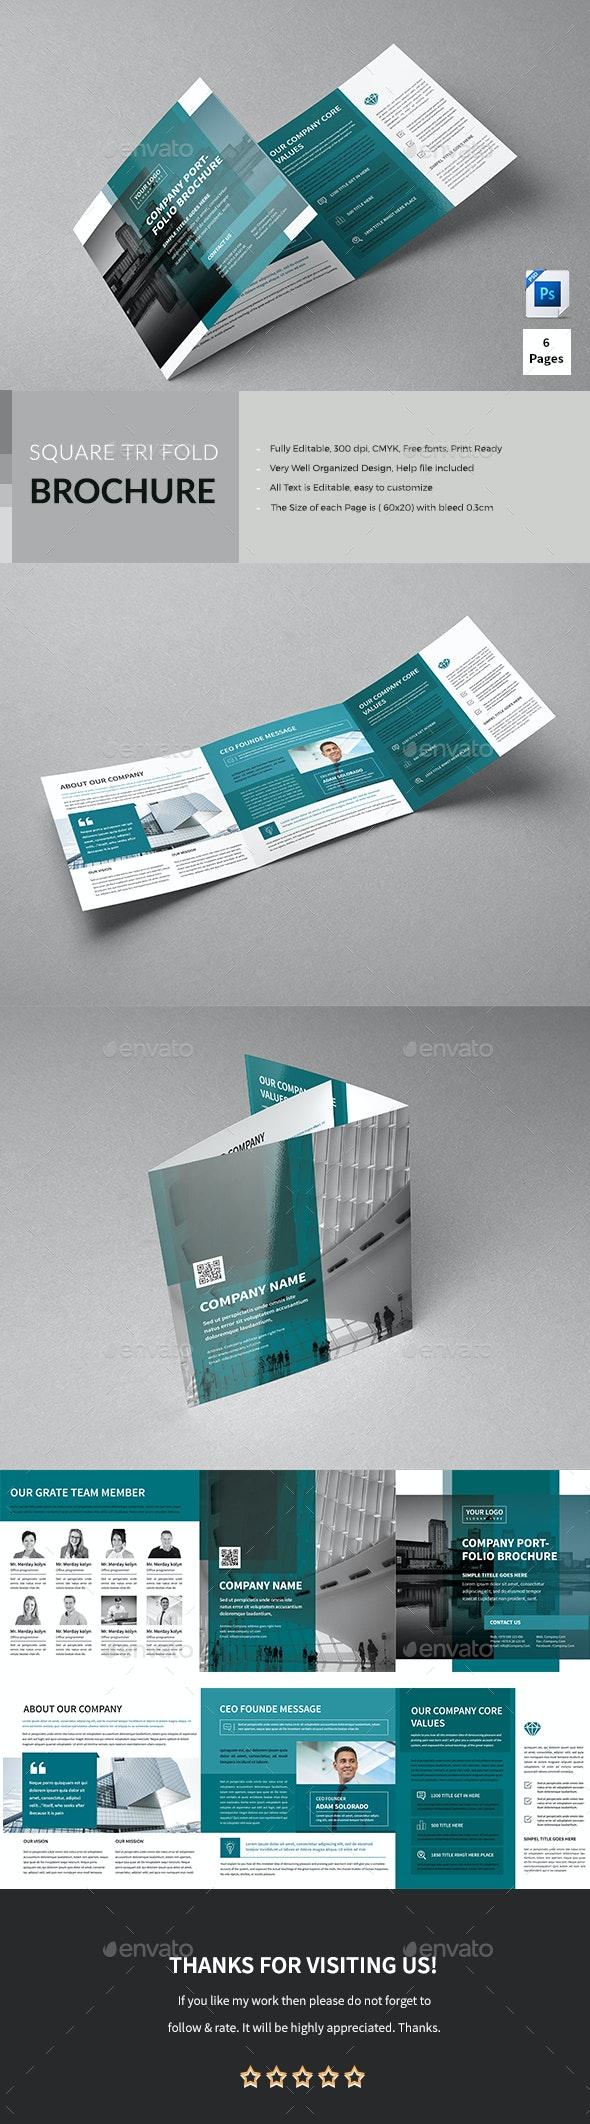 Corporate Square Trifold Brochure - Corporate Brochures